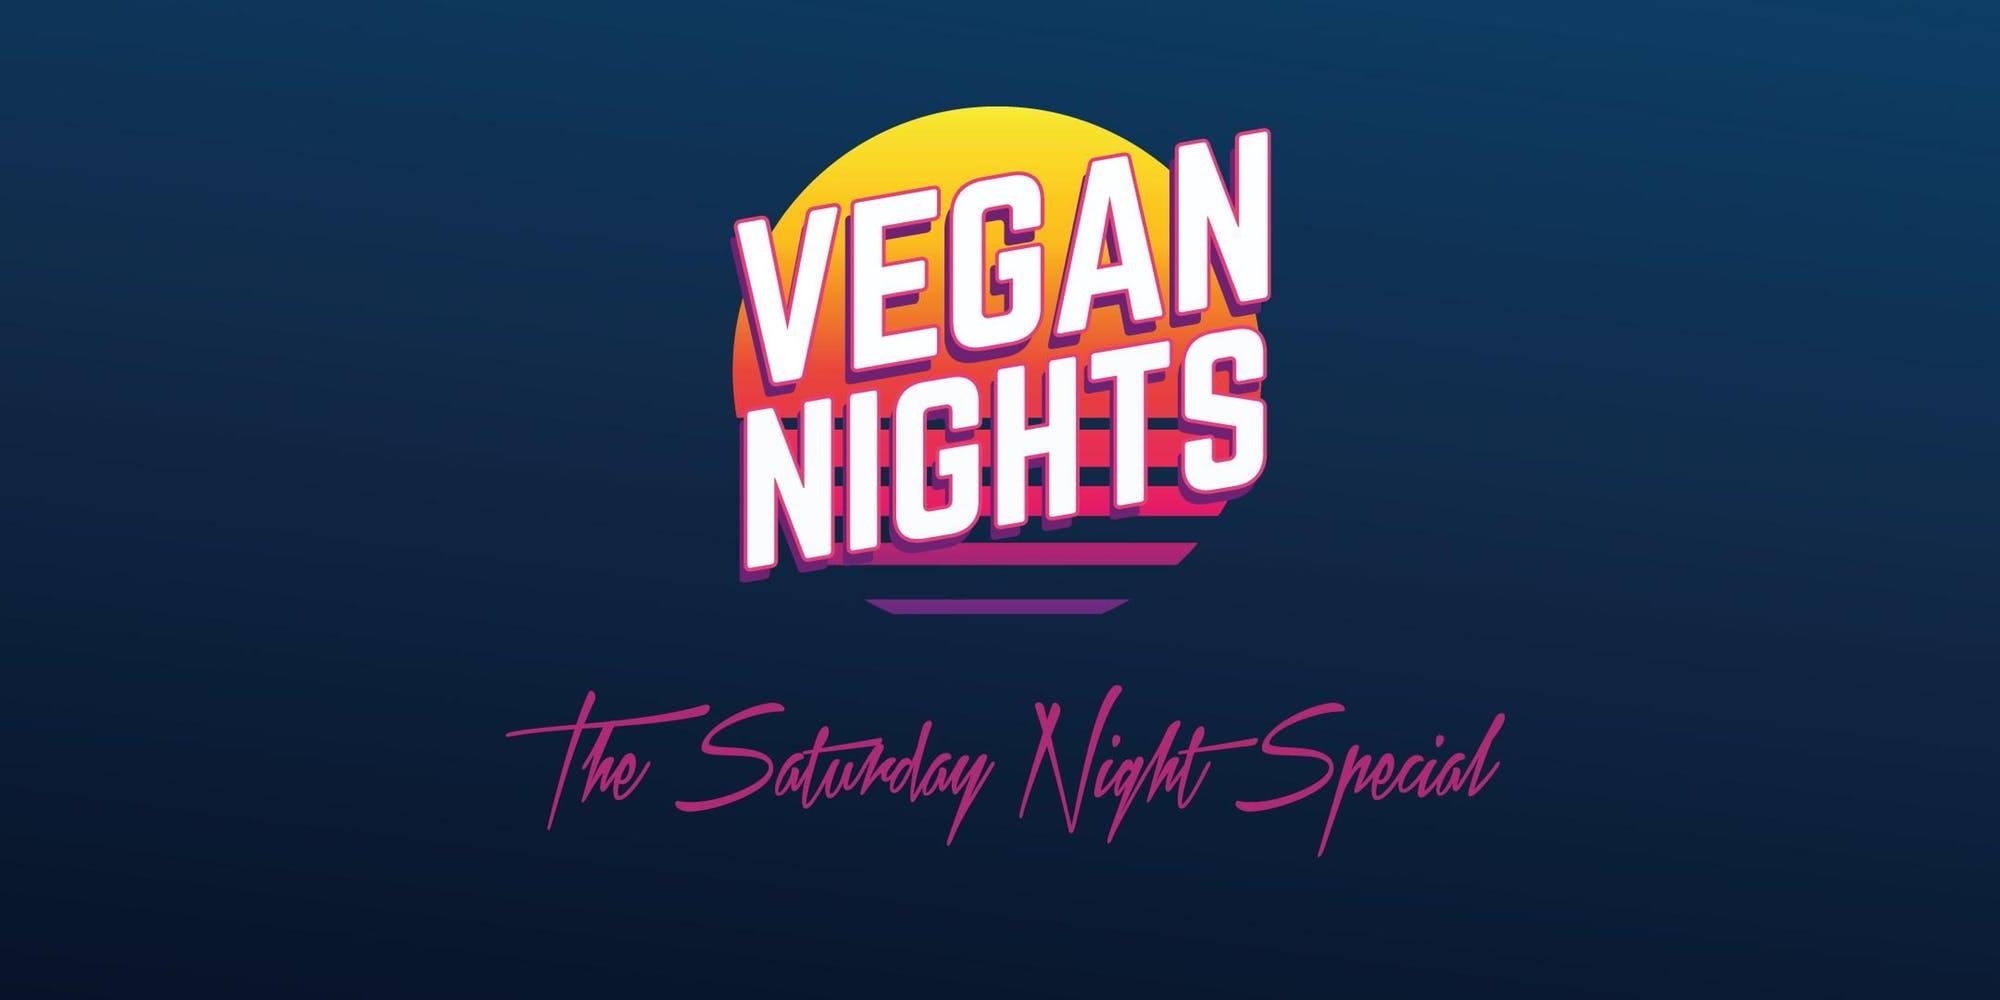 Island Glitter x Vegan Nights